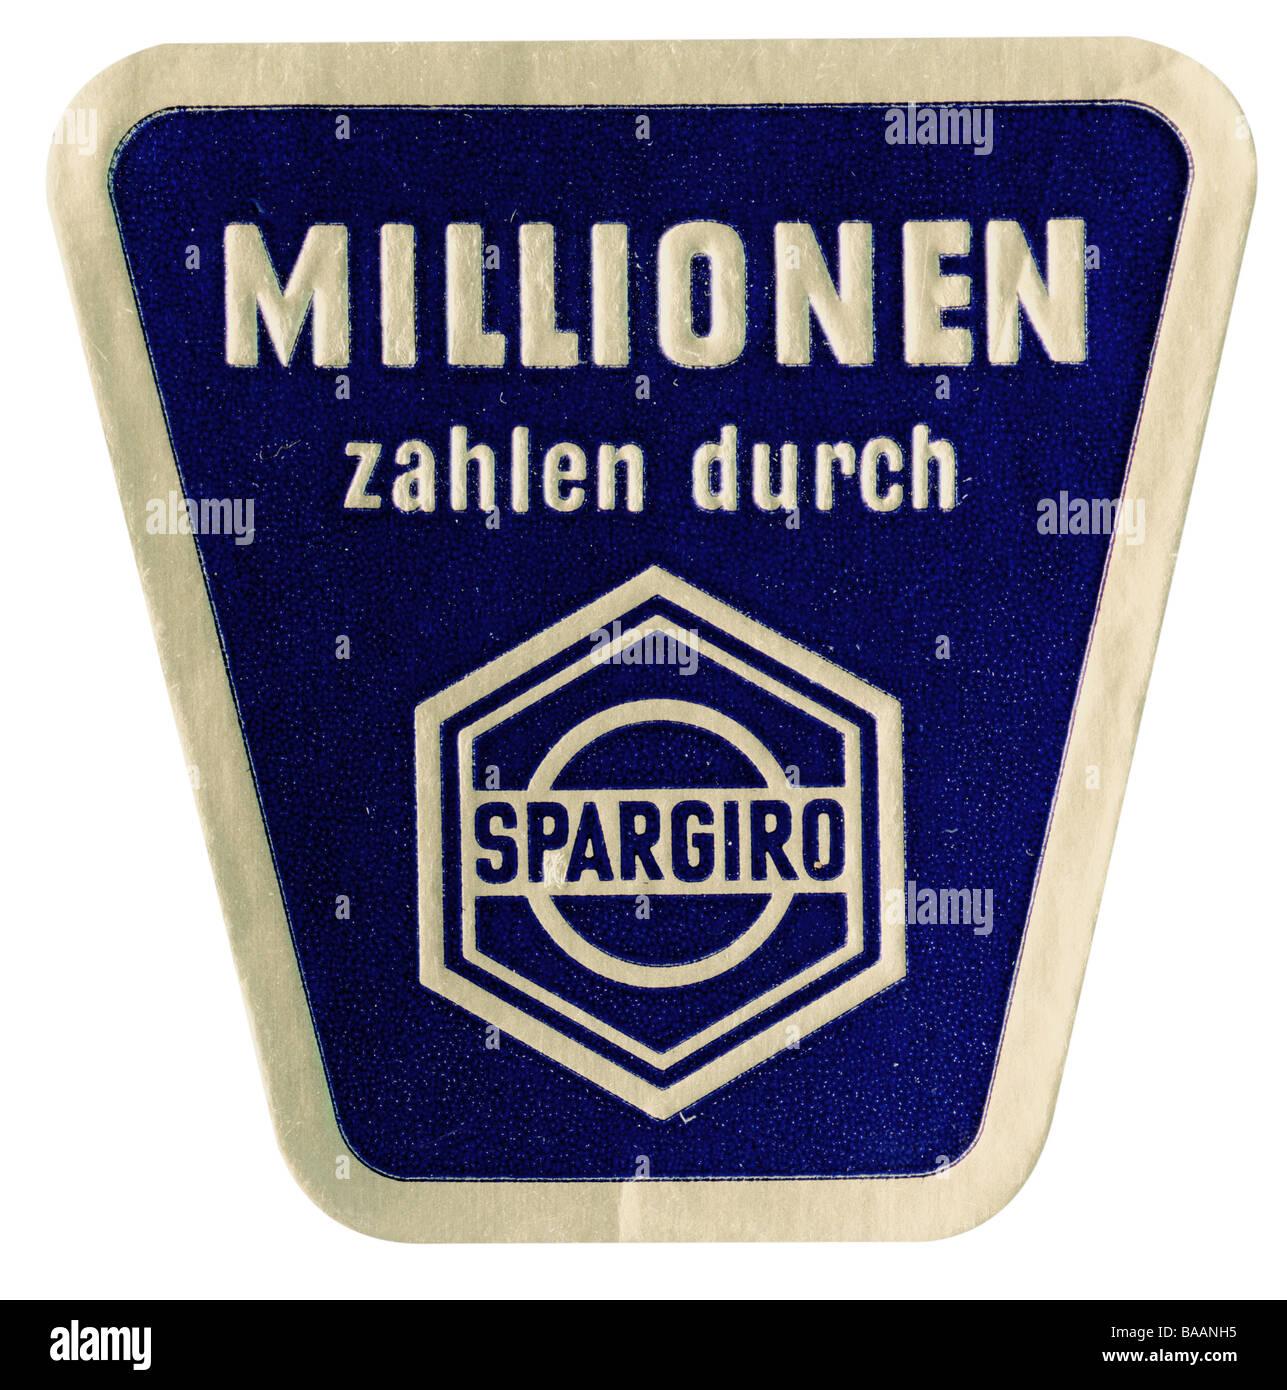 advertising, stamp 'Millionen zahlen durch Spargiro' (million people paying by Spargiro), Germany, 1960s, - Stock Image